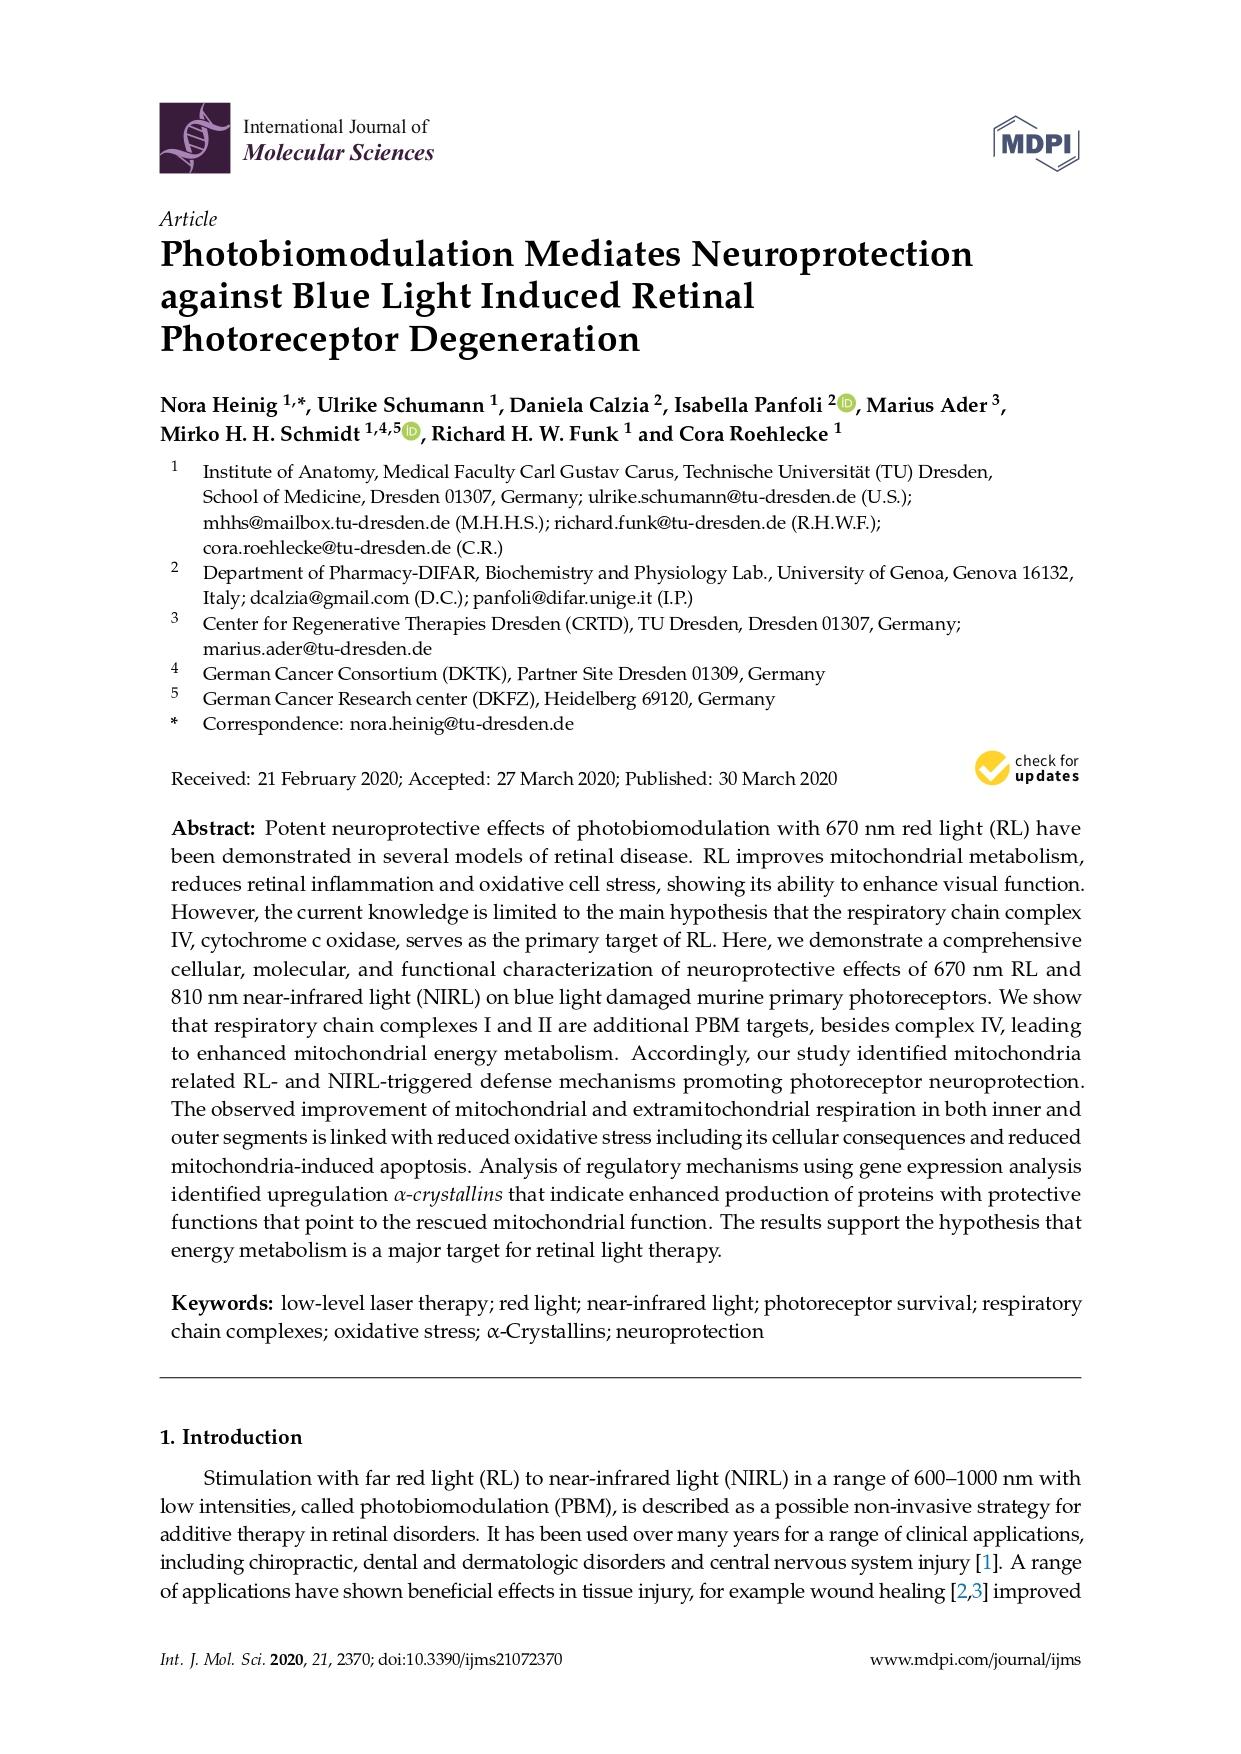 2020 Photobiomodulation Mediates Neuroprotection against Blue Light Induced Retinal Photoreceptor Degeneration